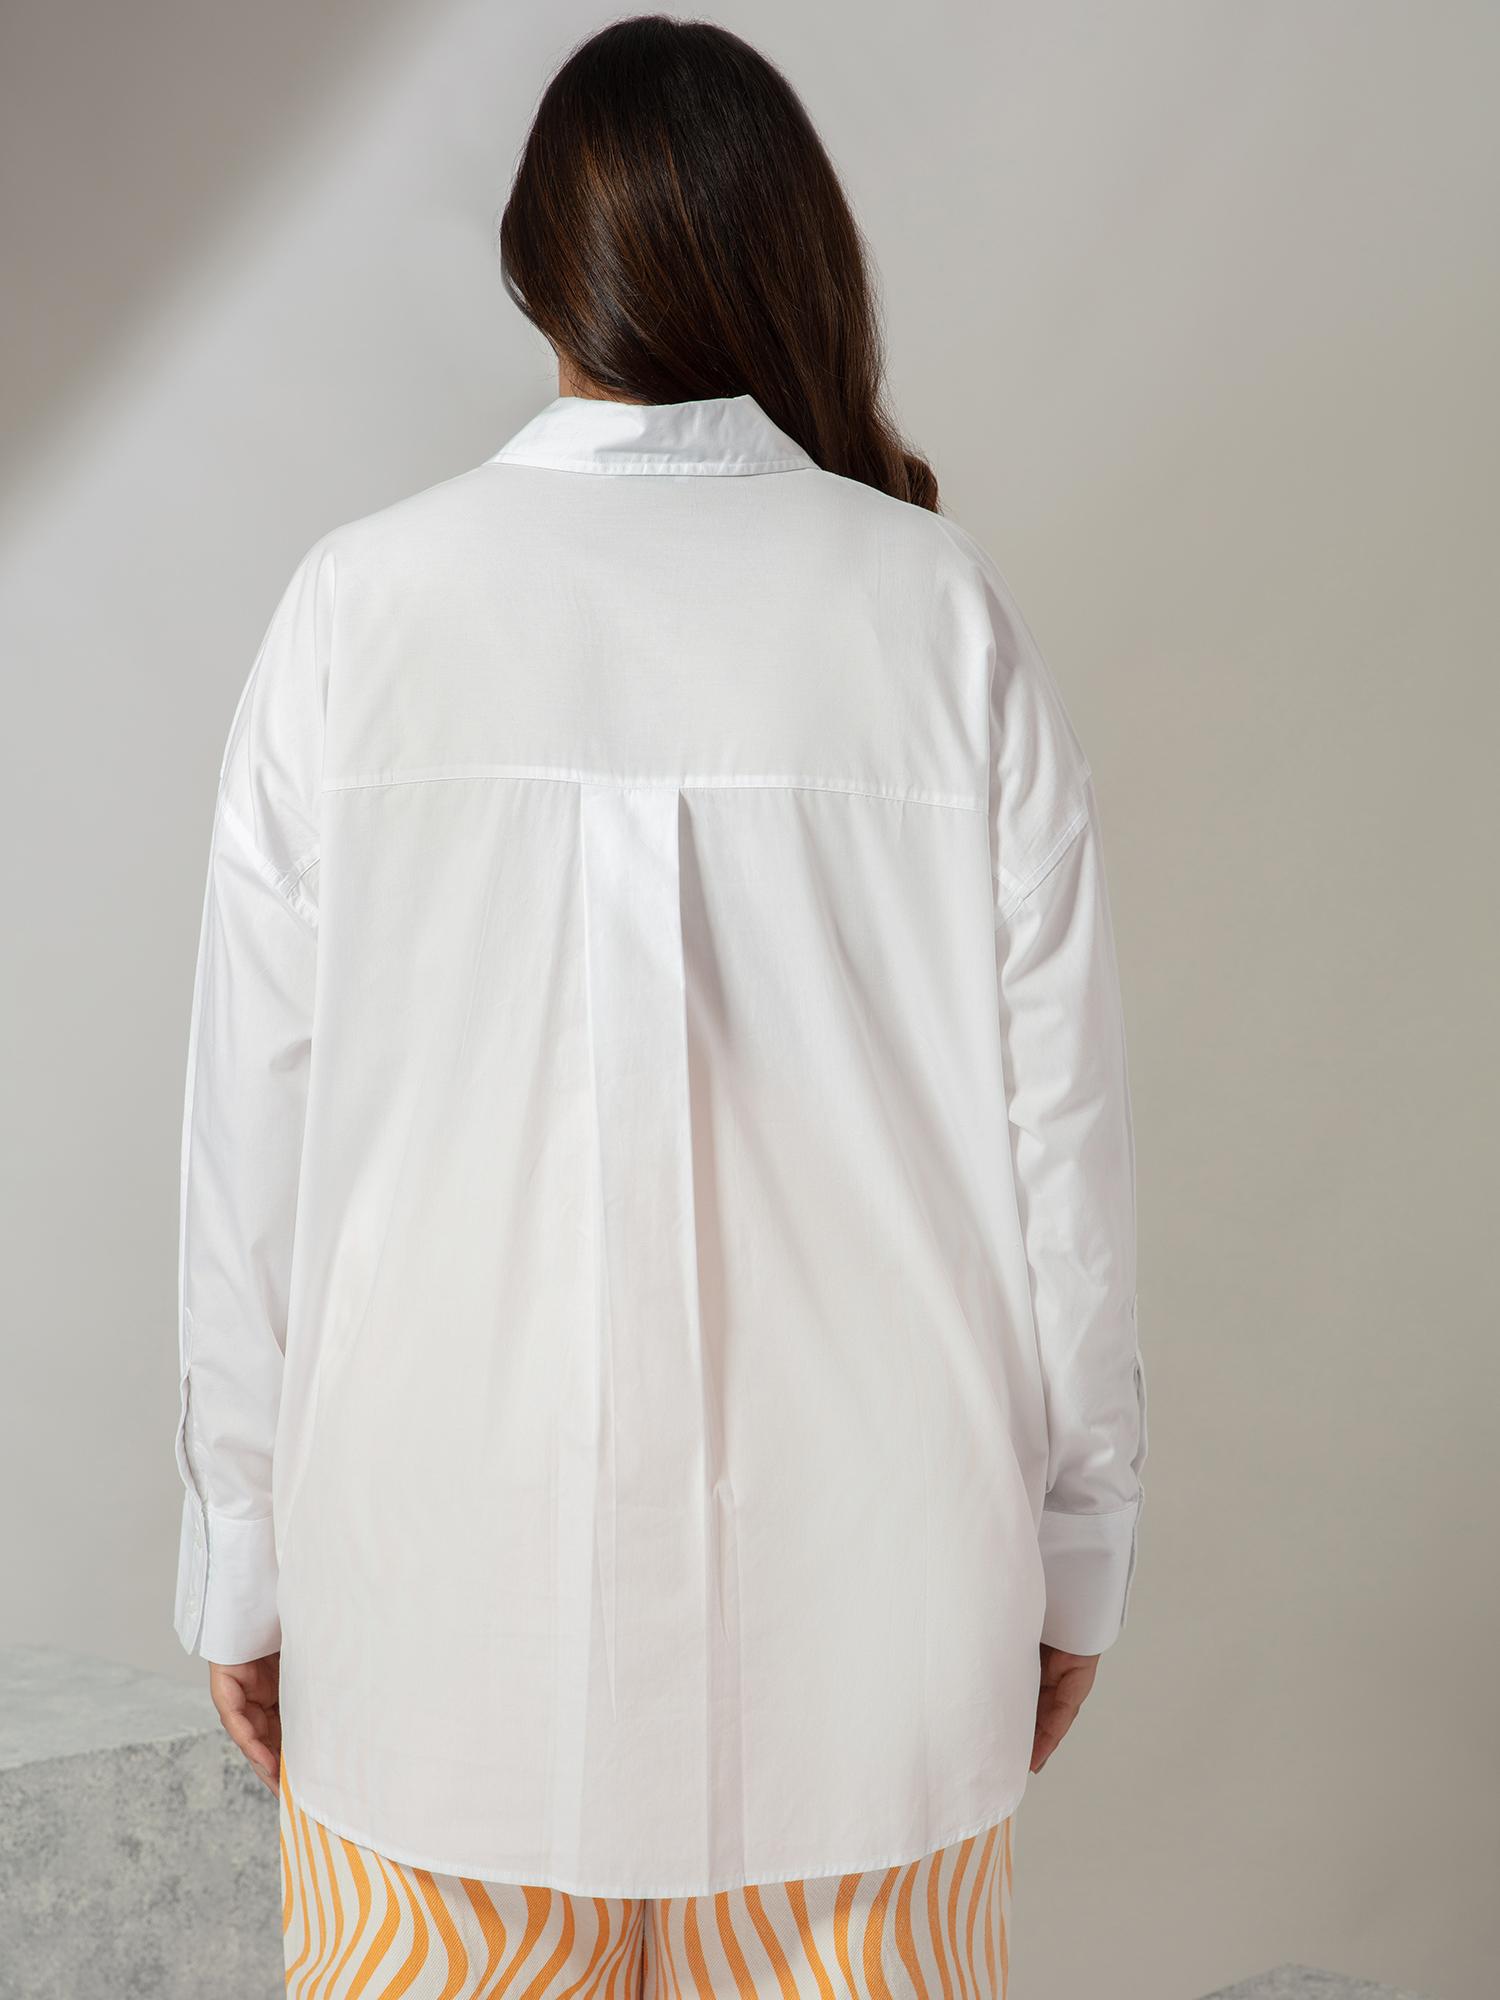 Tops-Pretty In White Shirt3